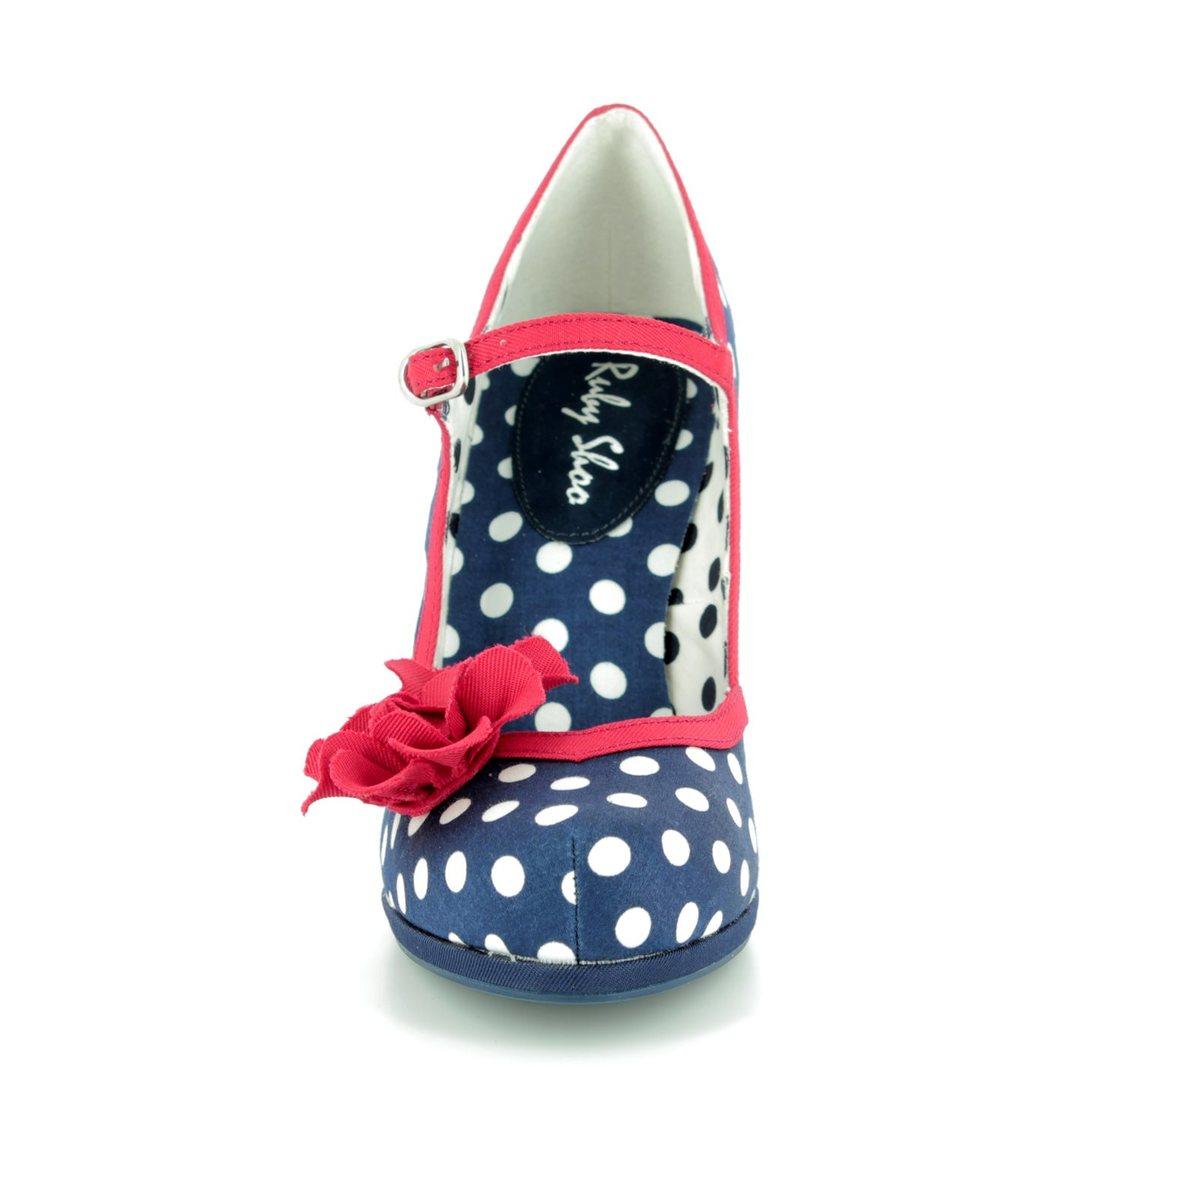 a8c982357b Ruby Shoo High-heeled Shoes - Navy multi - 09180/70 HANNAH